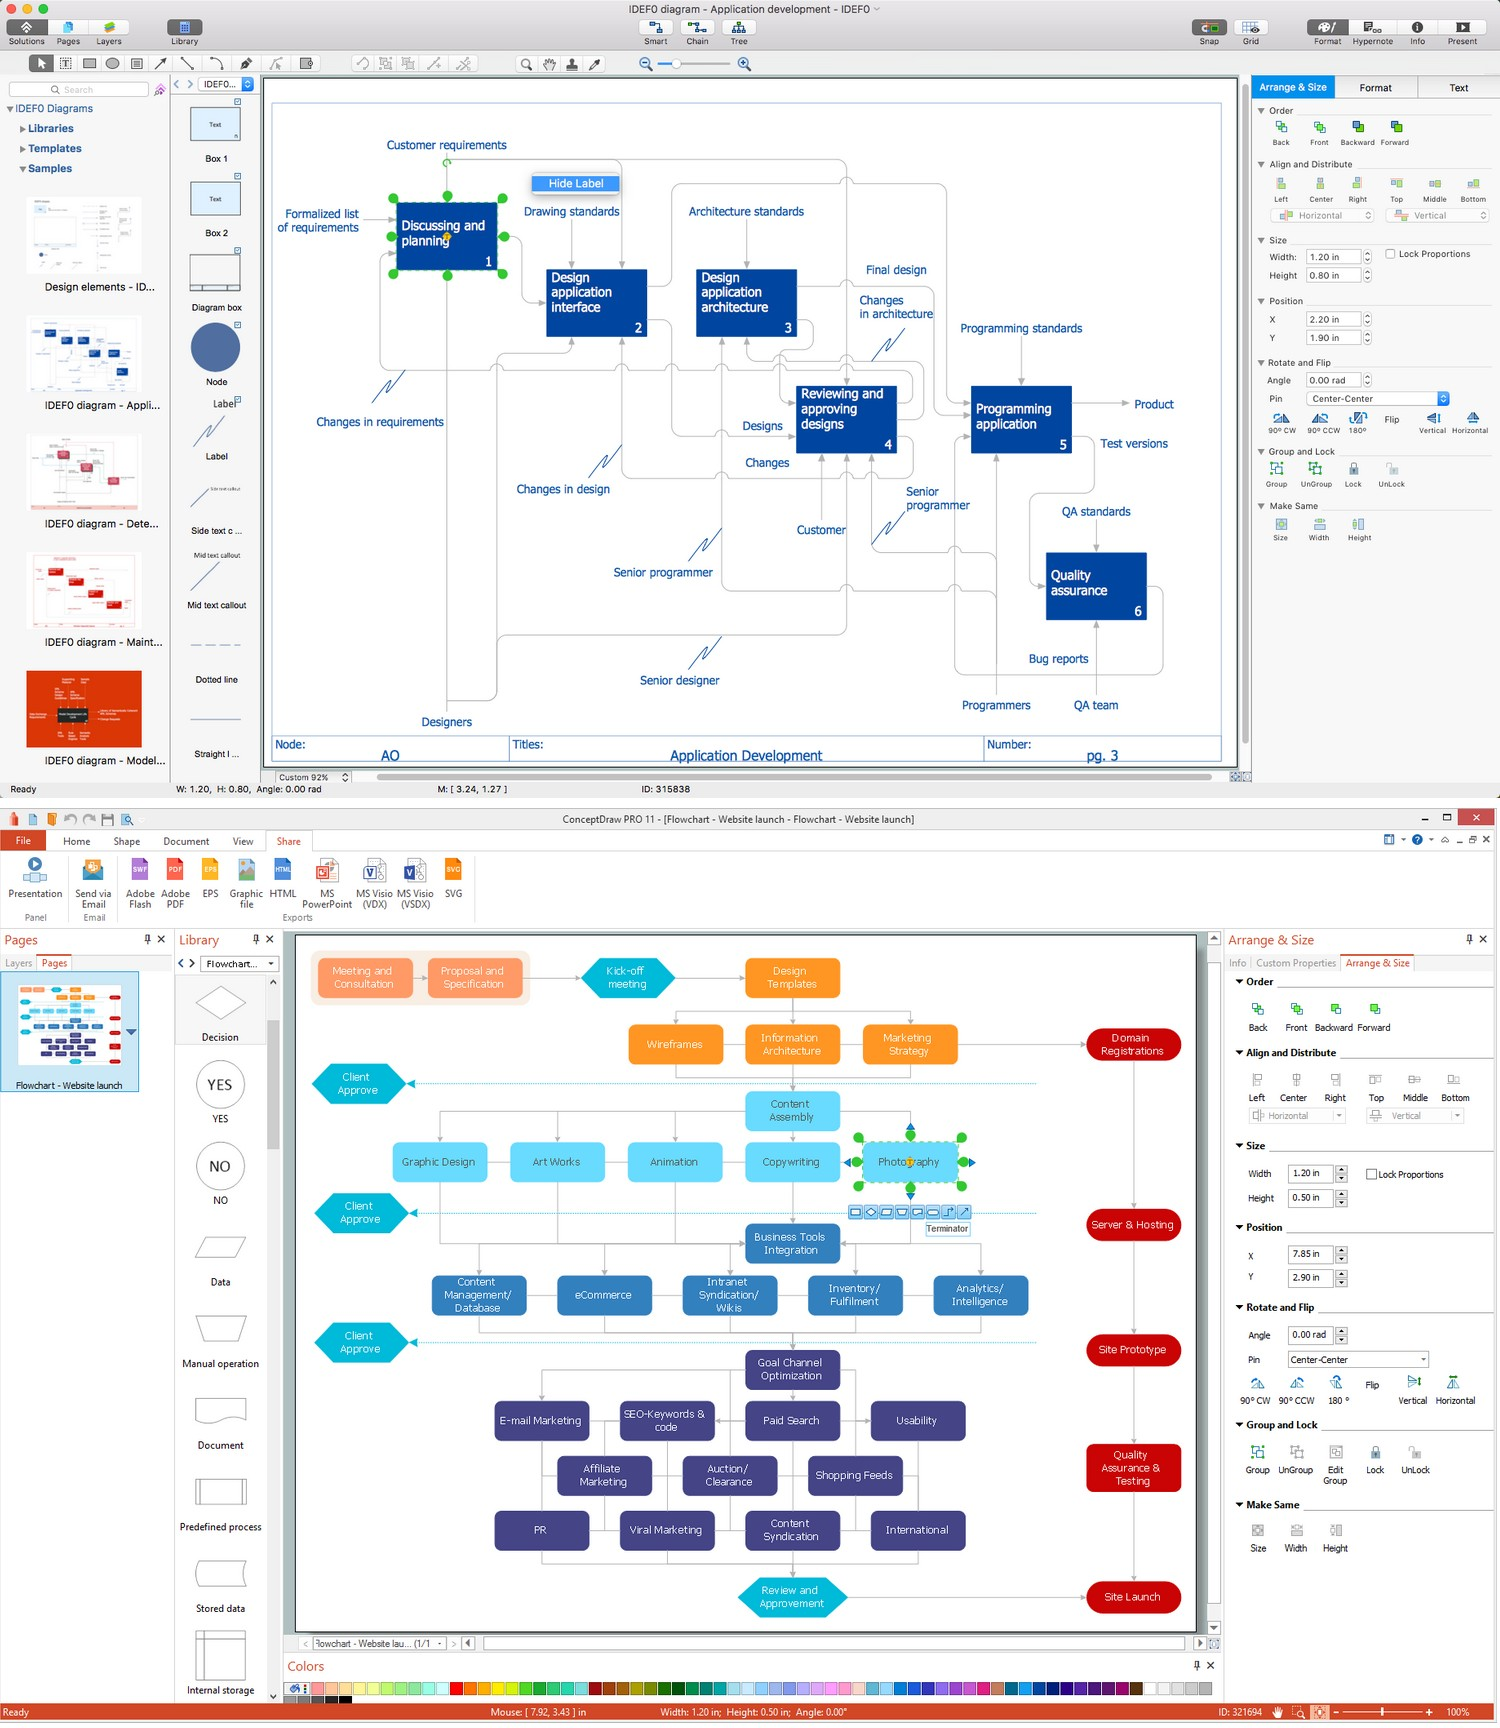 Process Flow Diagram Chemical Engineering Flowchart software Of Process Flow Diagram Chemical Engineering